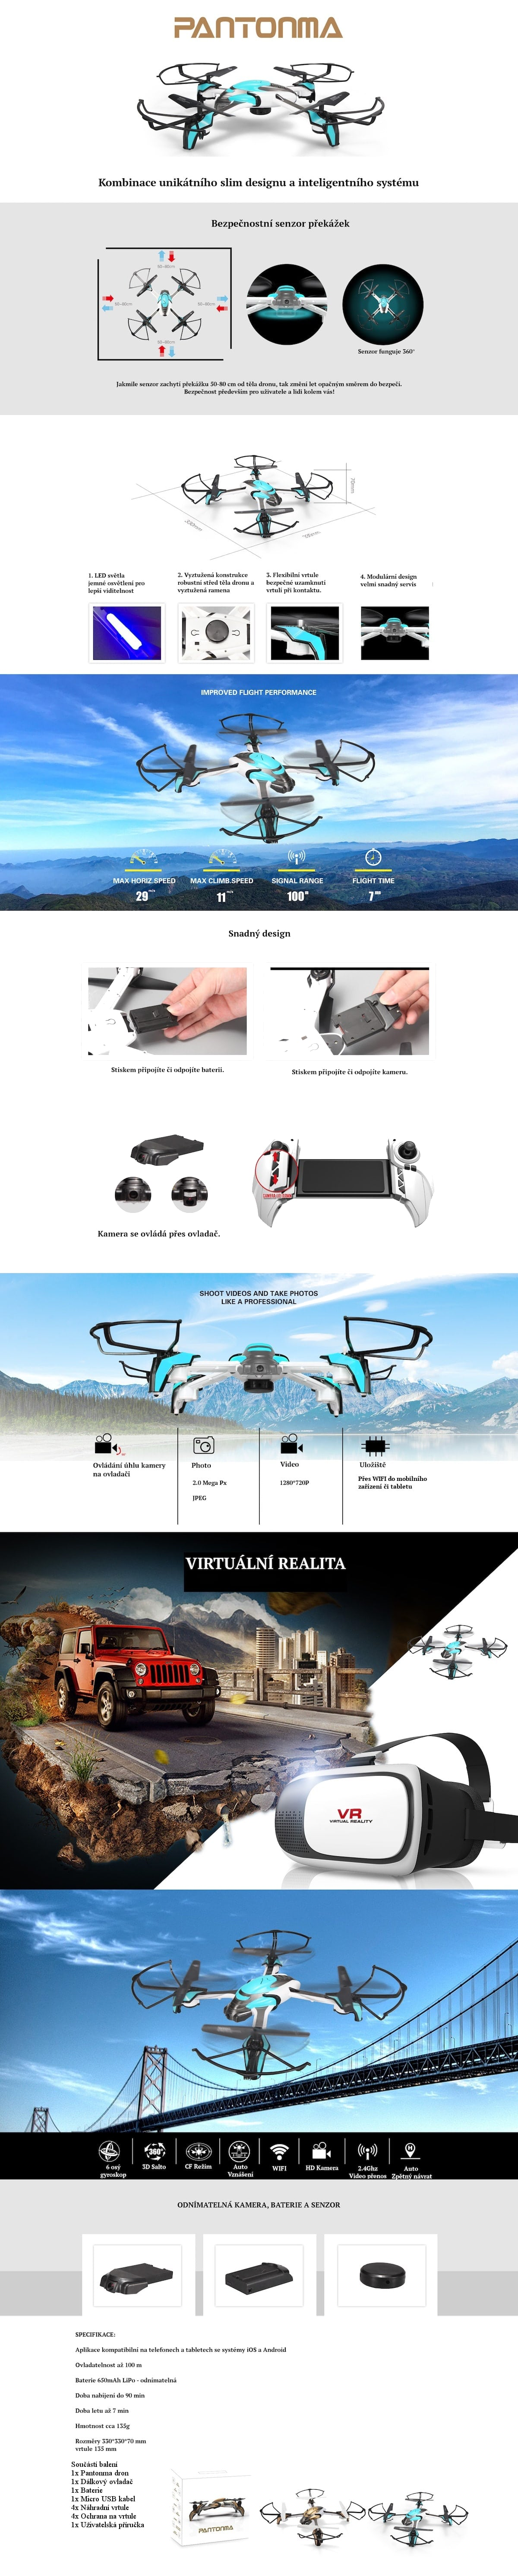 pantonma-drone-wifi-dalkovy-s-ovladacem-bryle-3--min